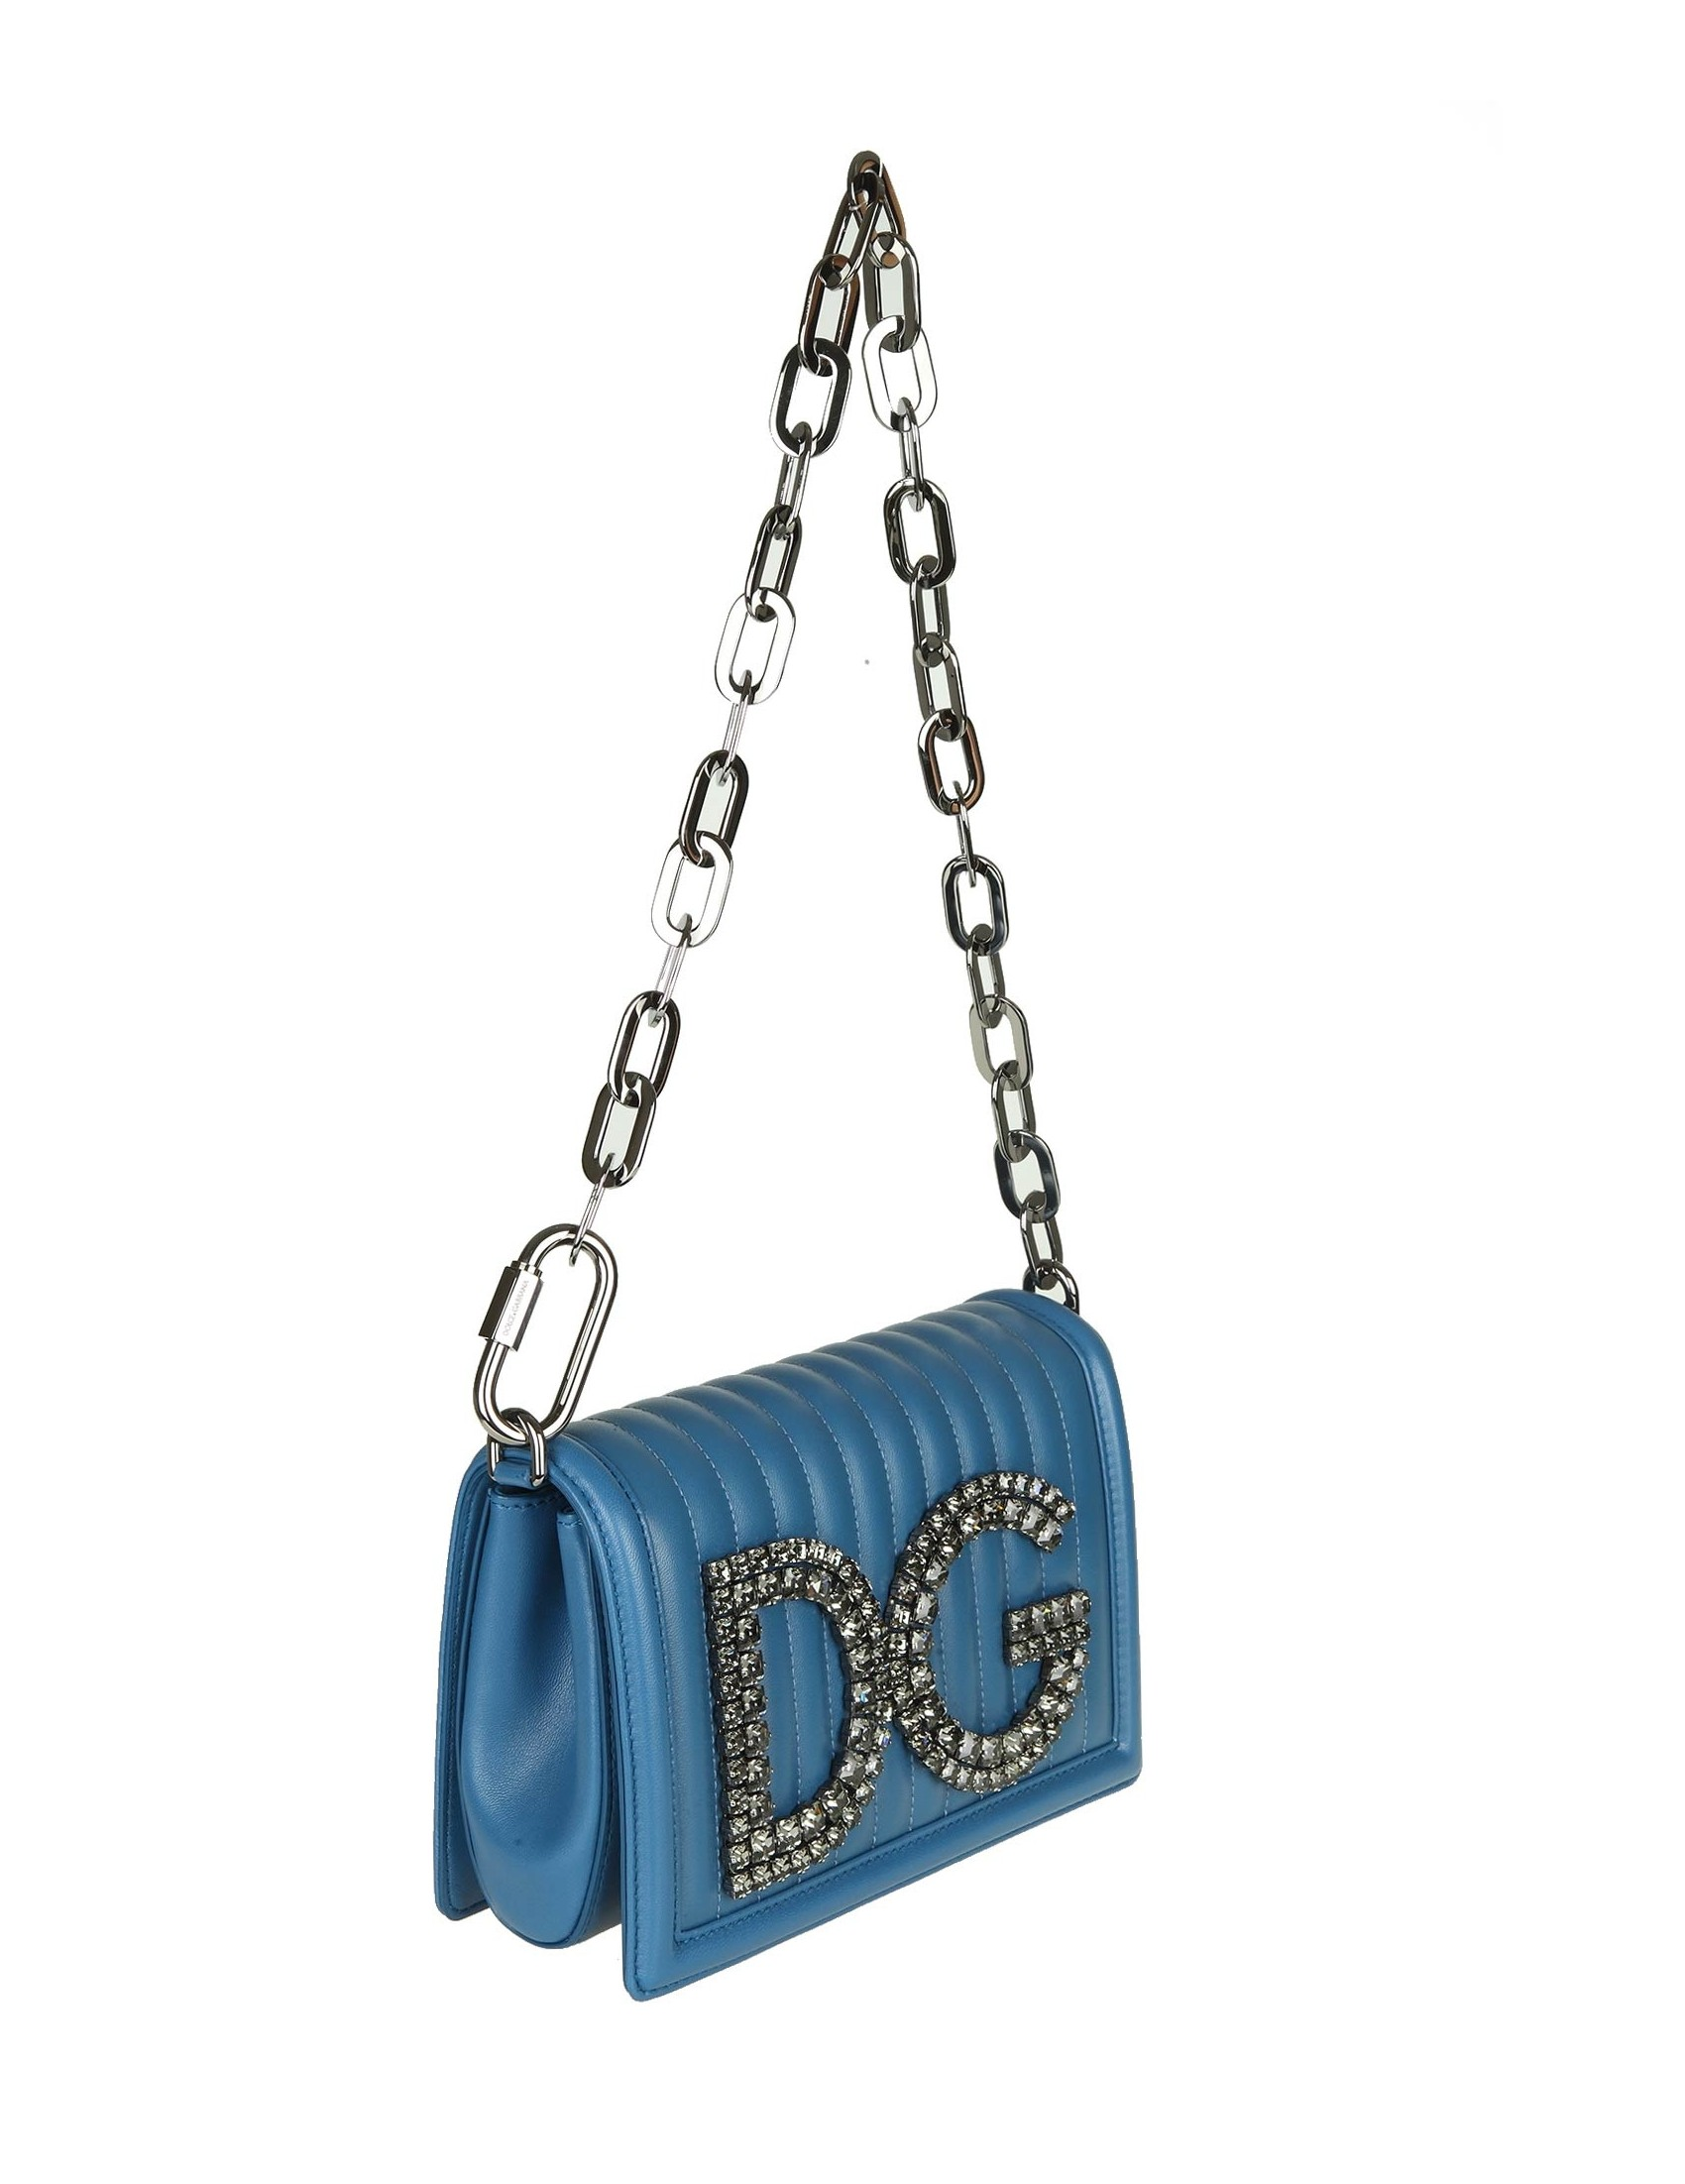 88ac4ca6155a4 Dg Matelasse  Blu Pelle Borsa Donna Pochette Dolce amp  Gabbana Colore  wnaqX4Z4